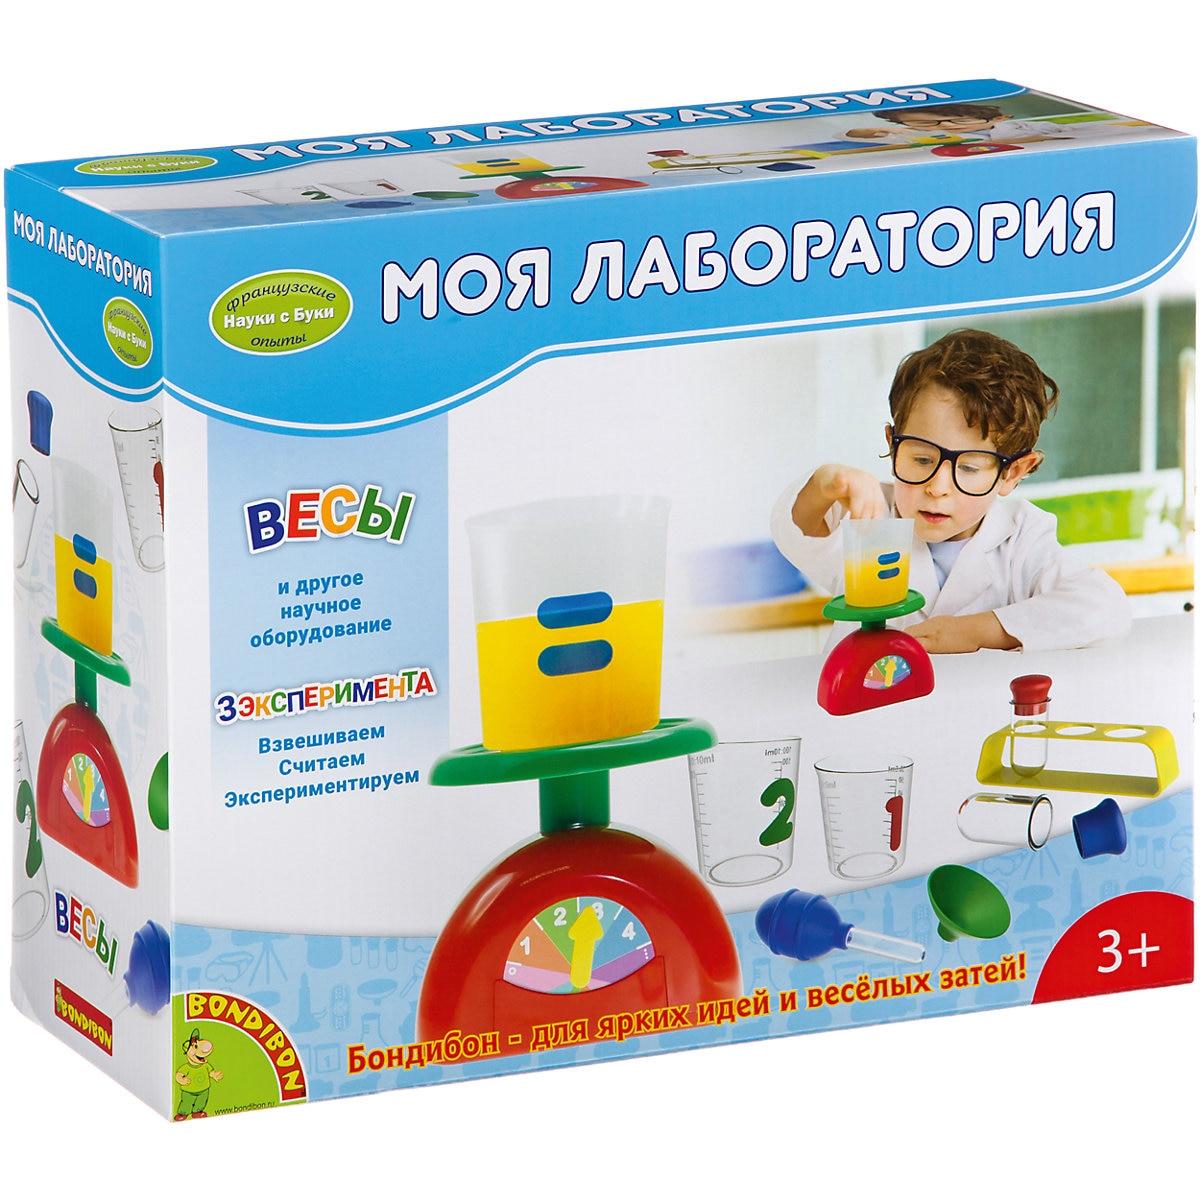 Bondibon Science 7420083 Experiments for children Educational toys Training toy Learning & Education MTpromo цены